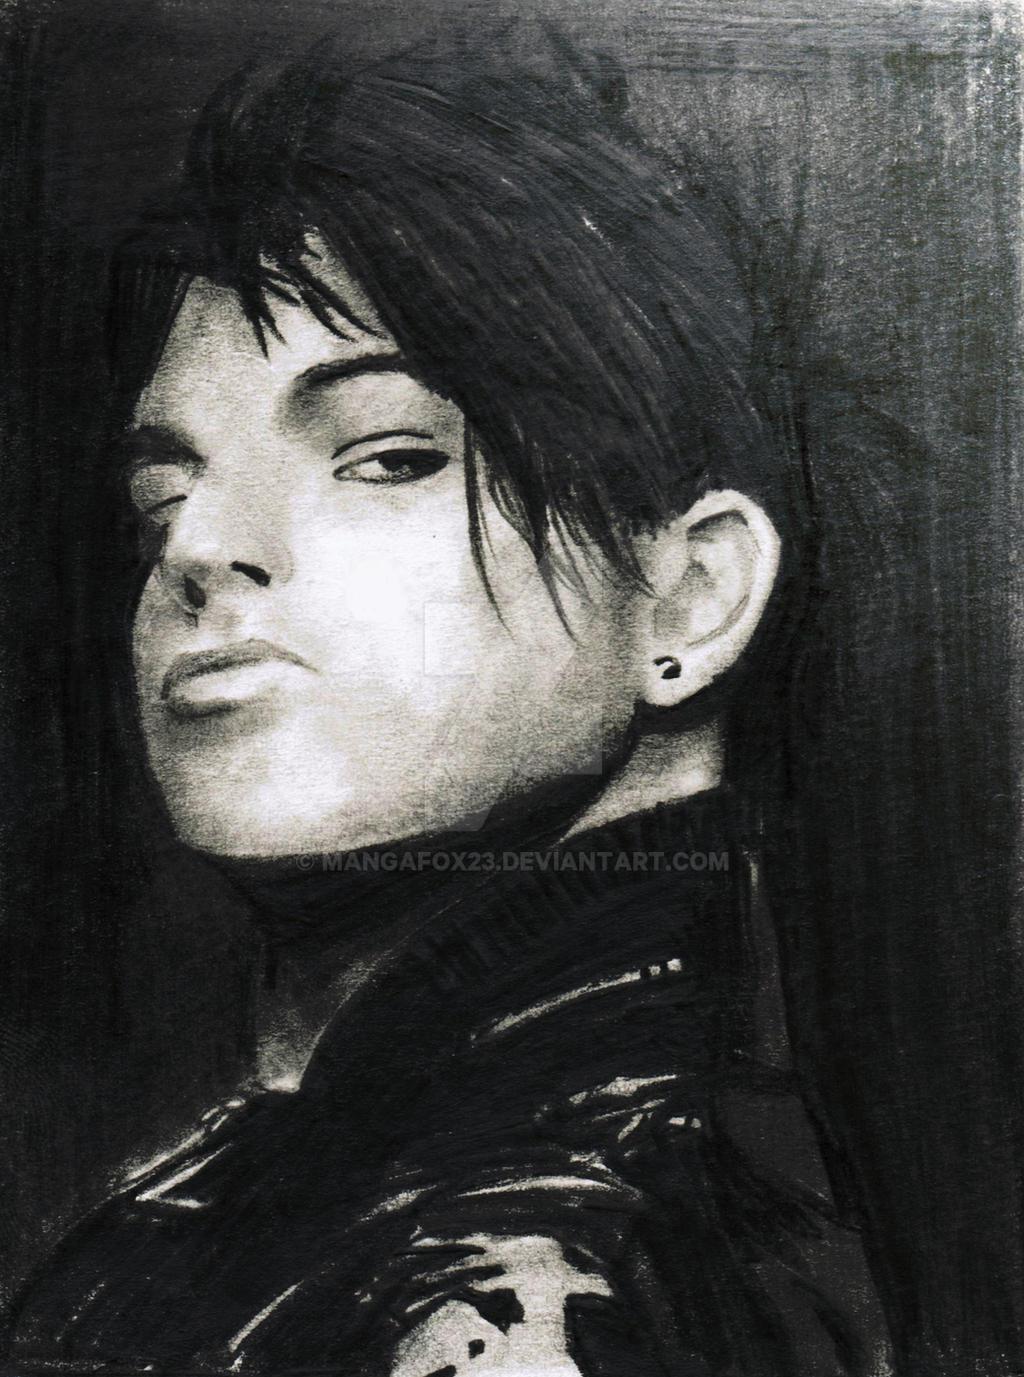 Adam Lambert portrait by mangafox23